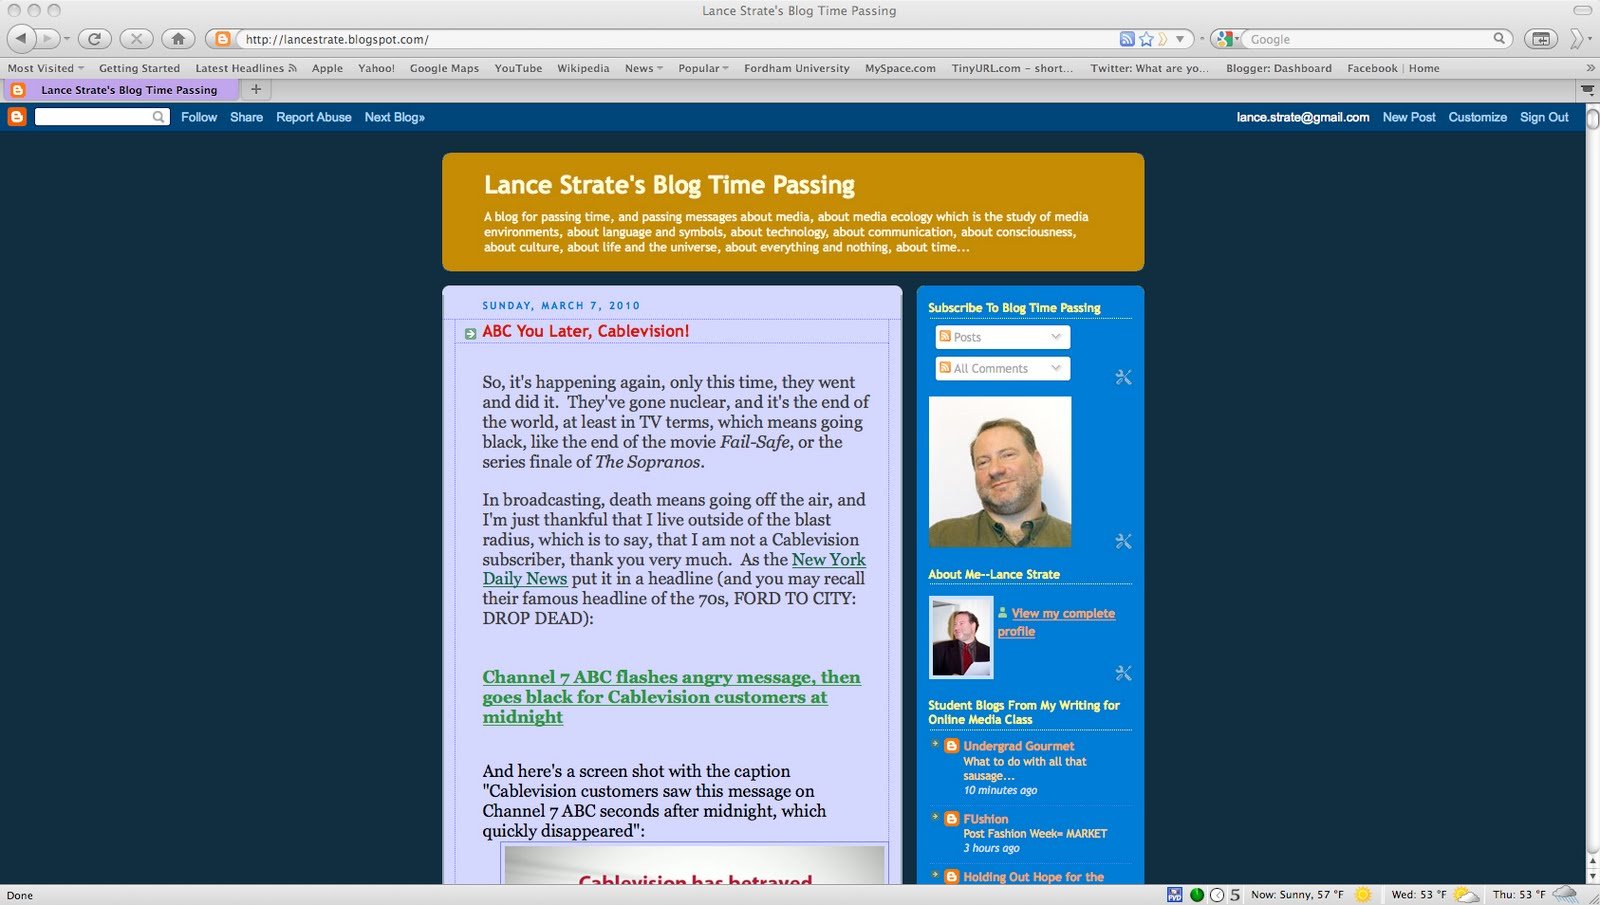 Lance Strates Blog Time Passing Blogwurst